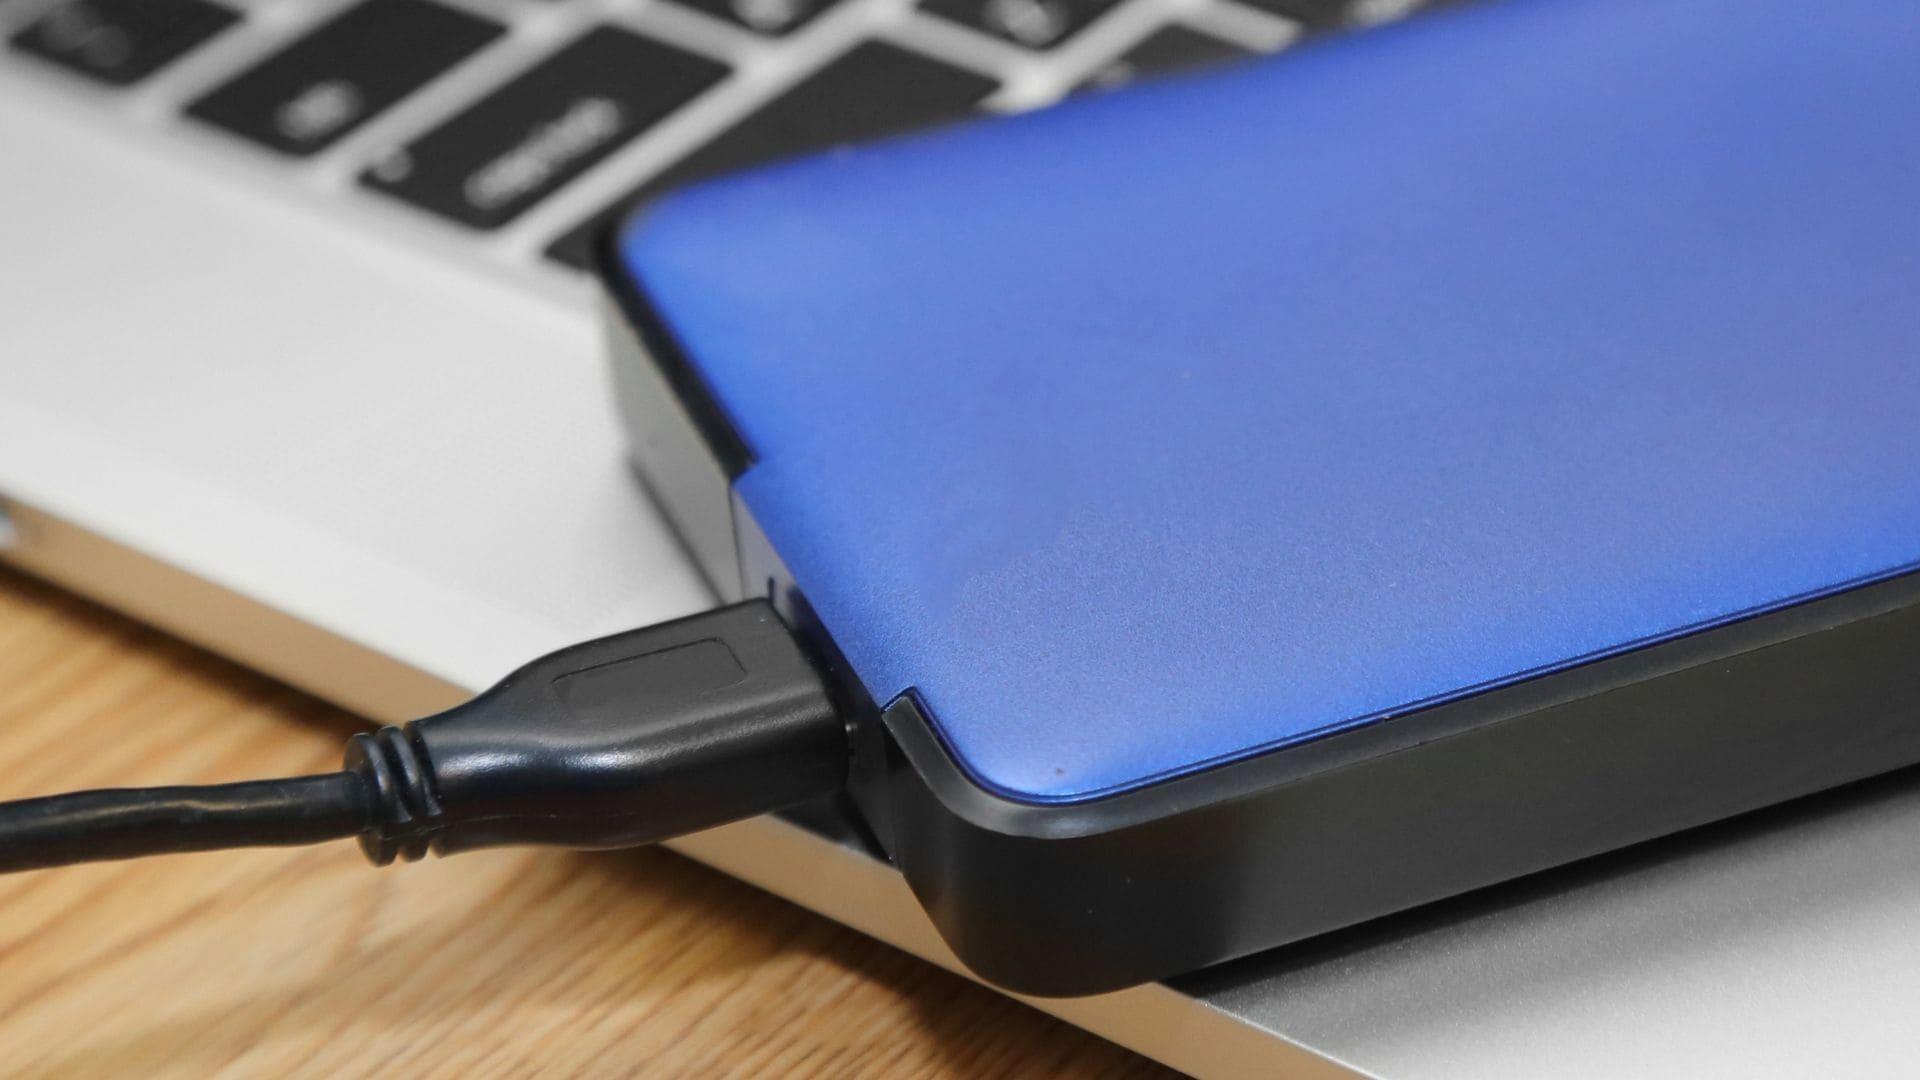 HD externo 1TB com cabo USB